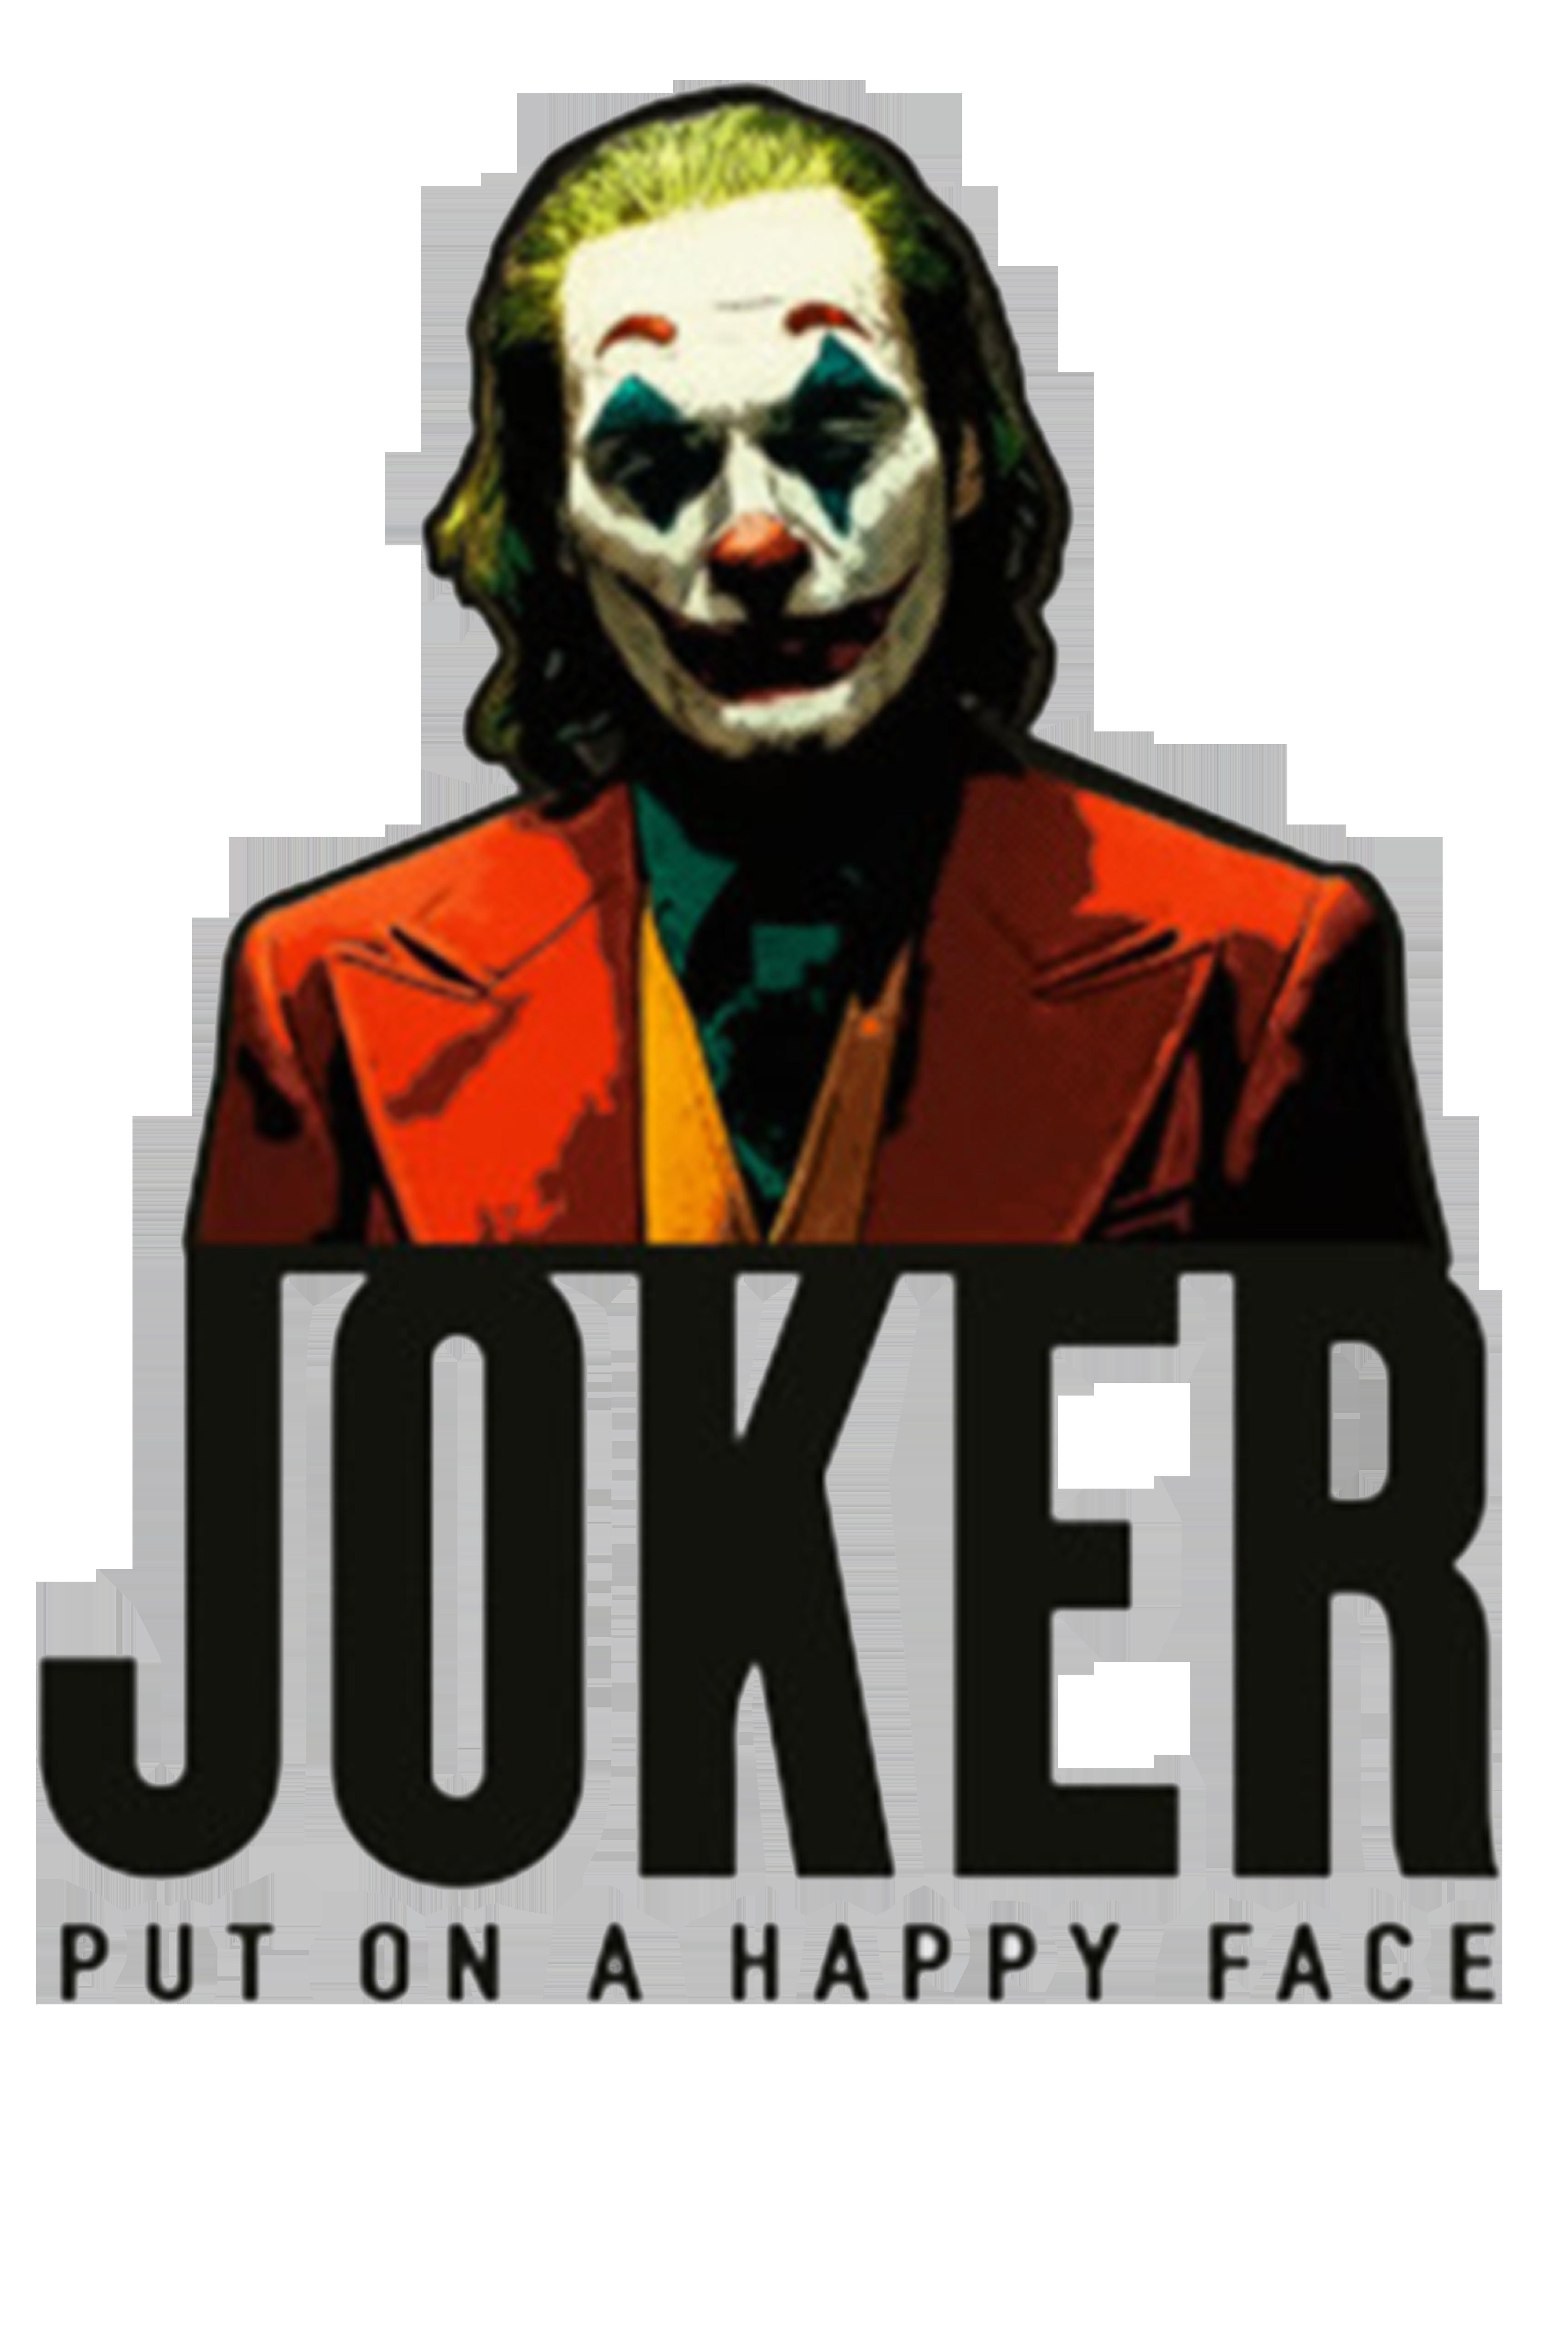 Joker Joaquin Phoenix 2019  Movies T-shirt